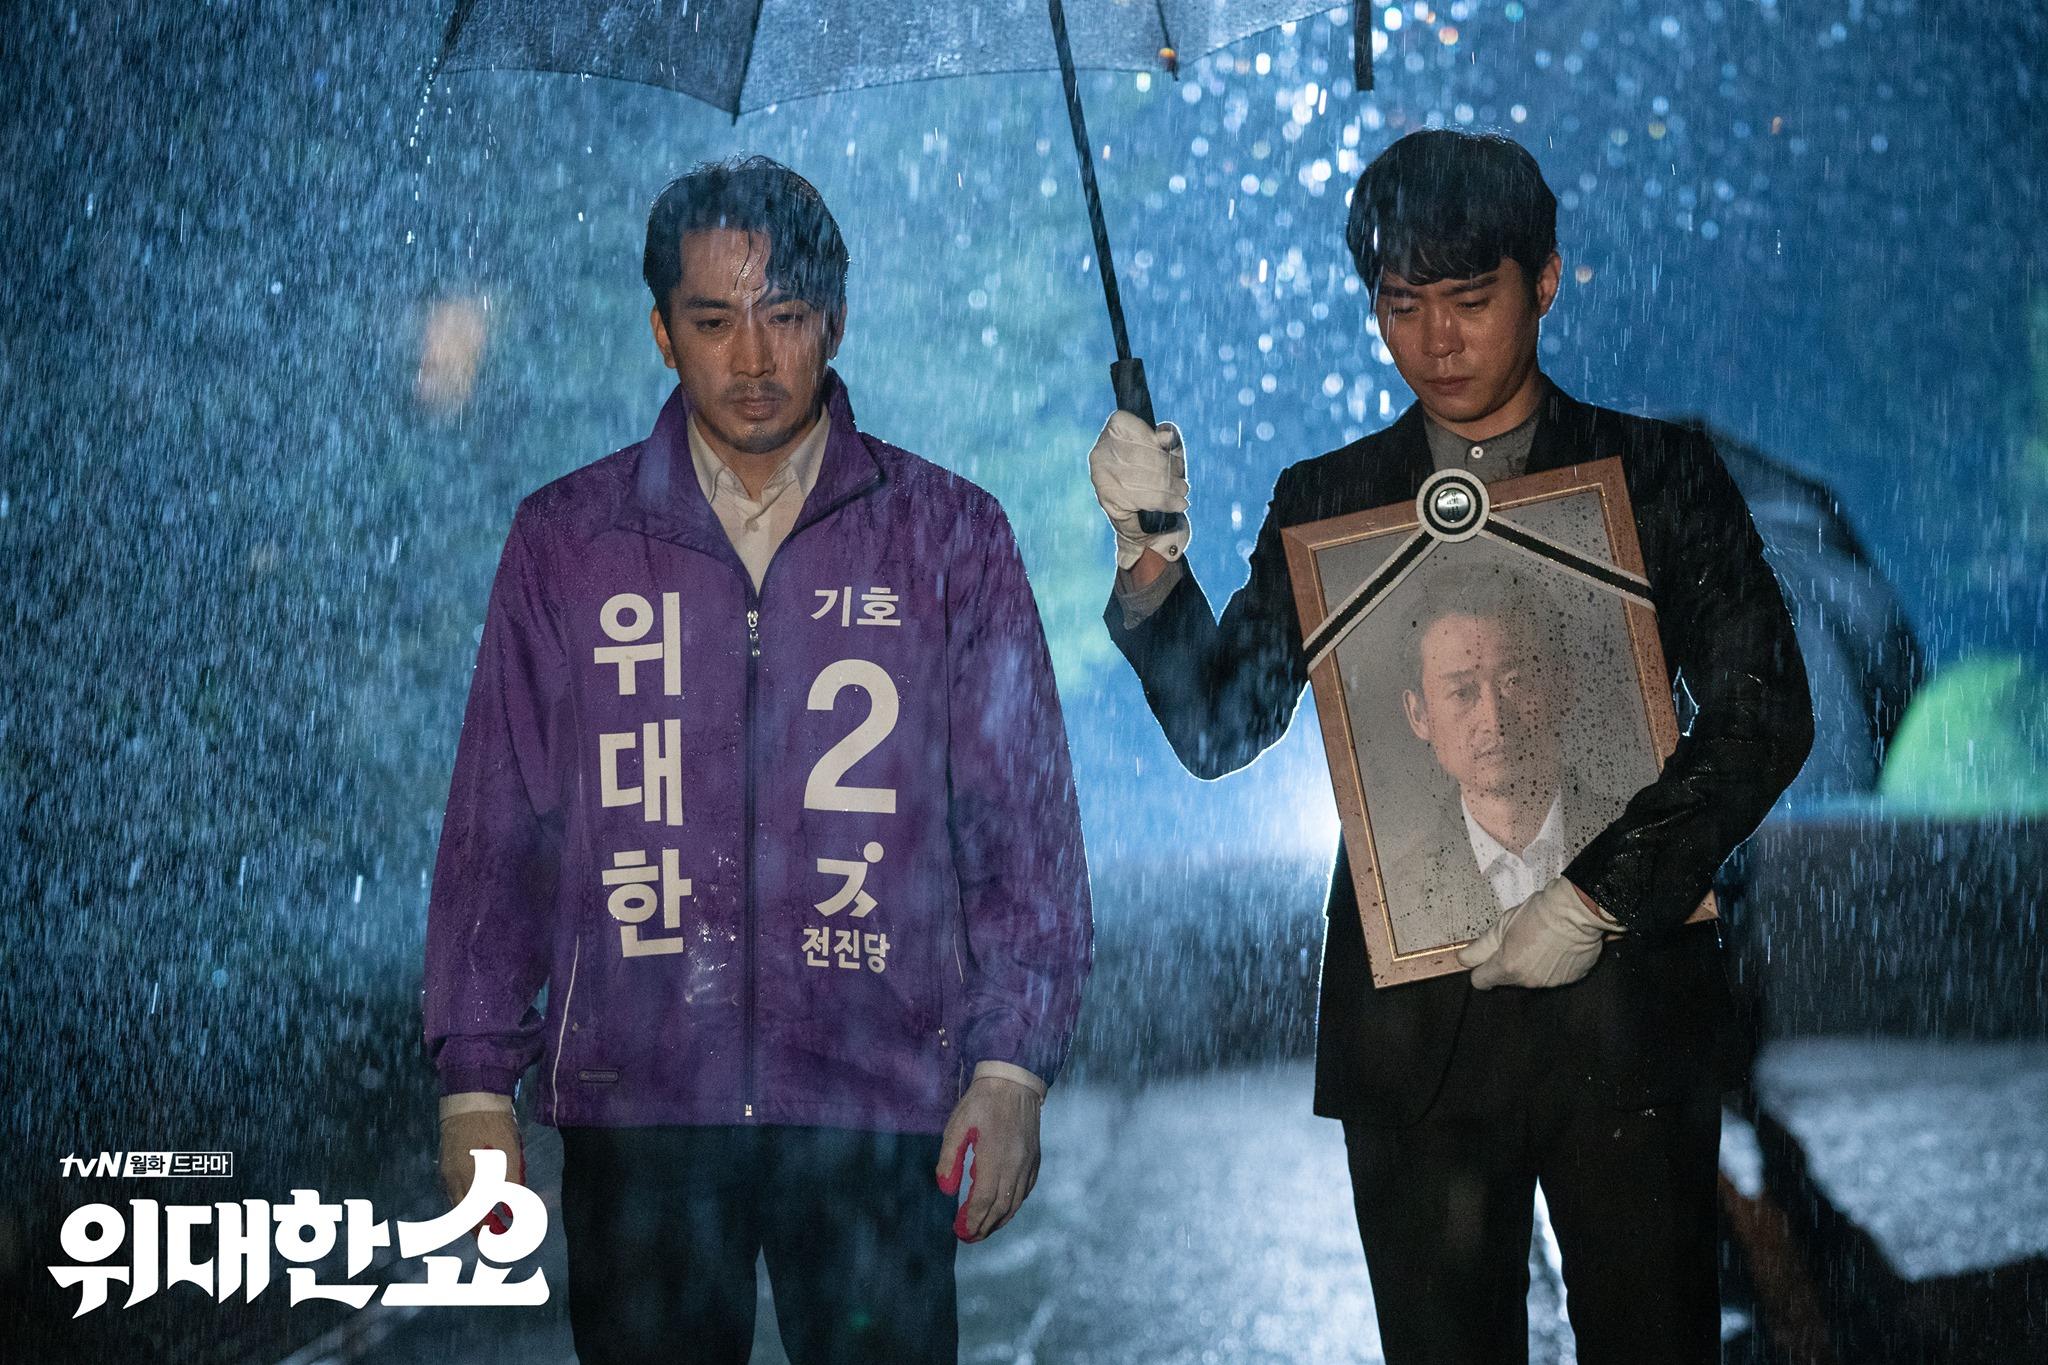 pojok-drama-the-great-show-kisah-politik-dan-cinta-ayah-anak-11-salam-korea